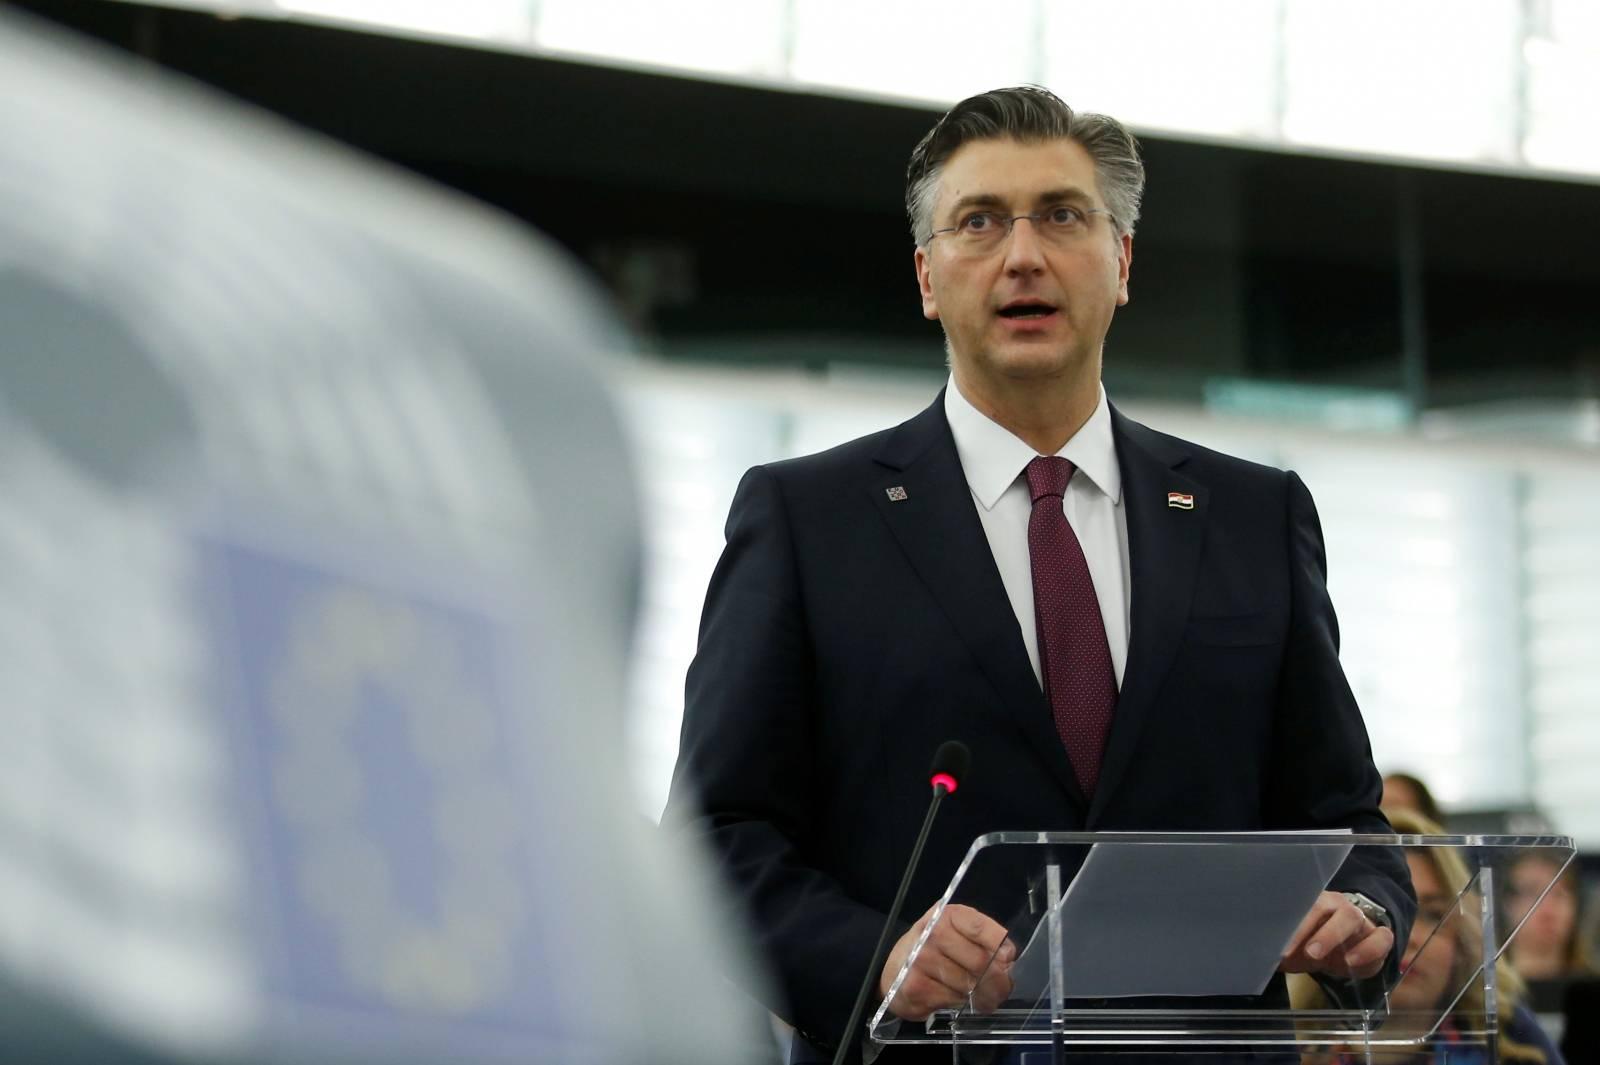 Croatia's Prime Minister Plenkovic addresses the European Parliament in Strasbourg